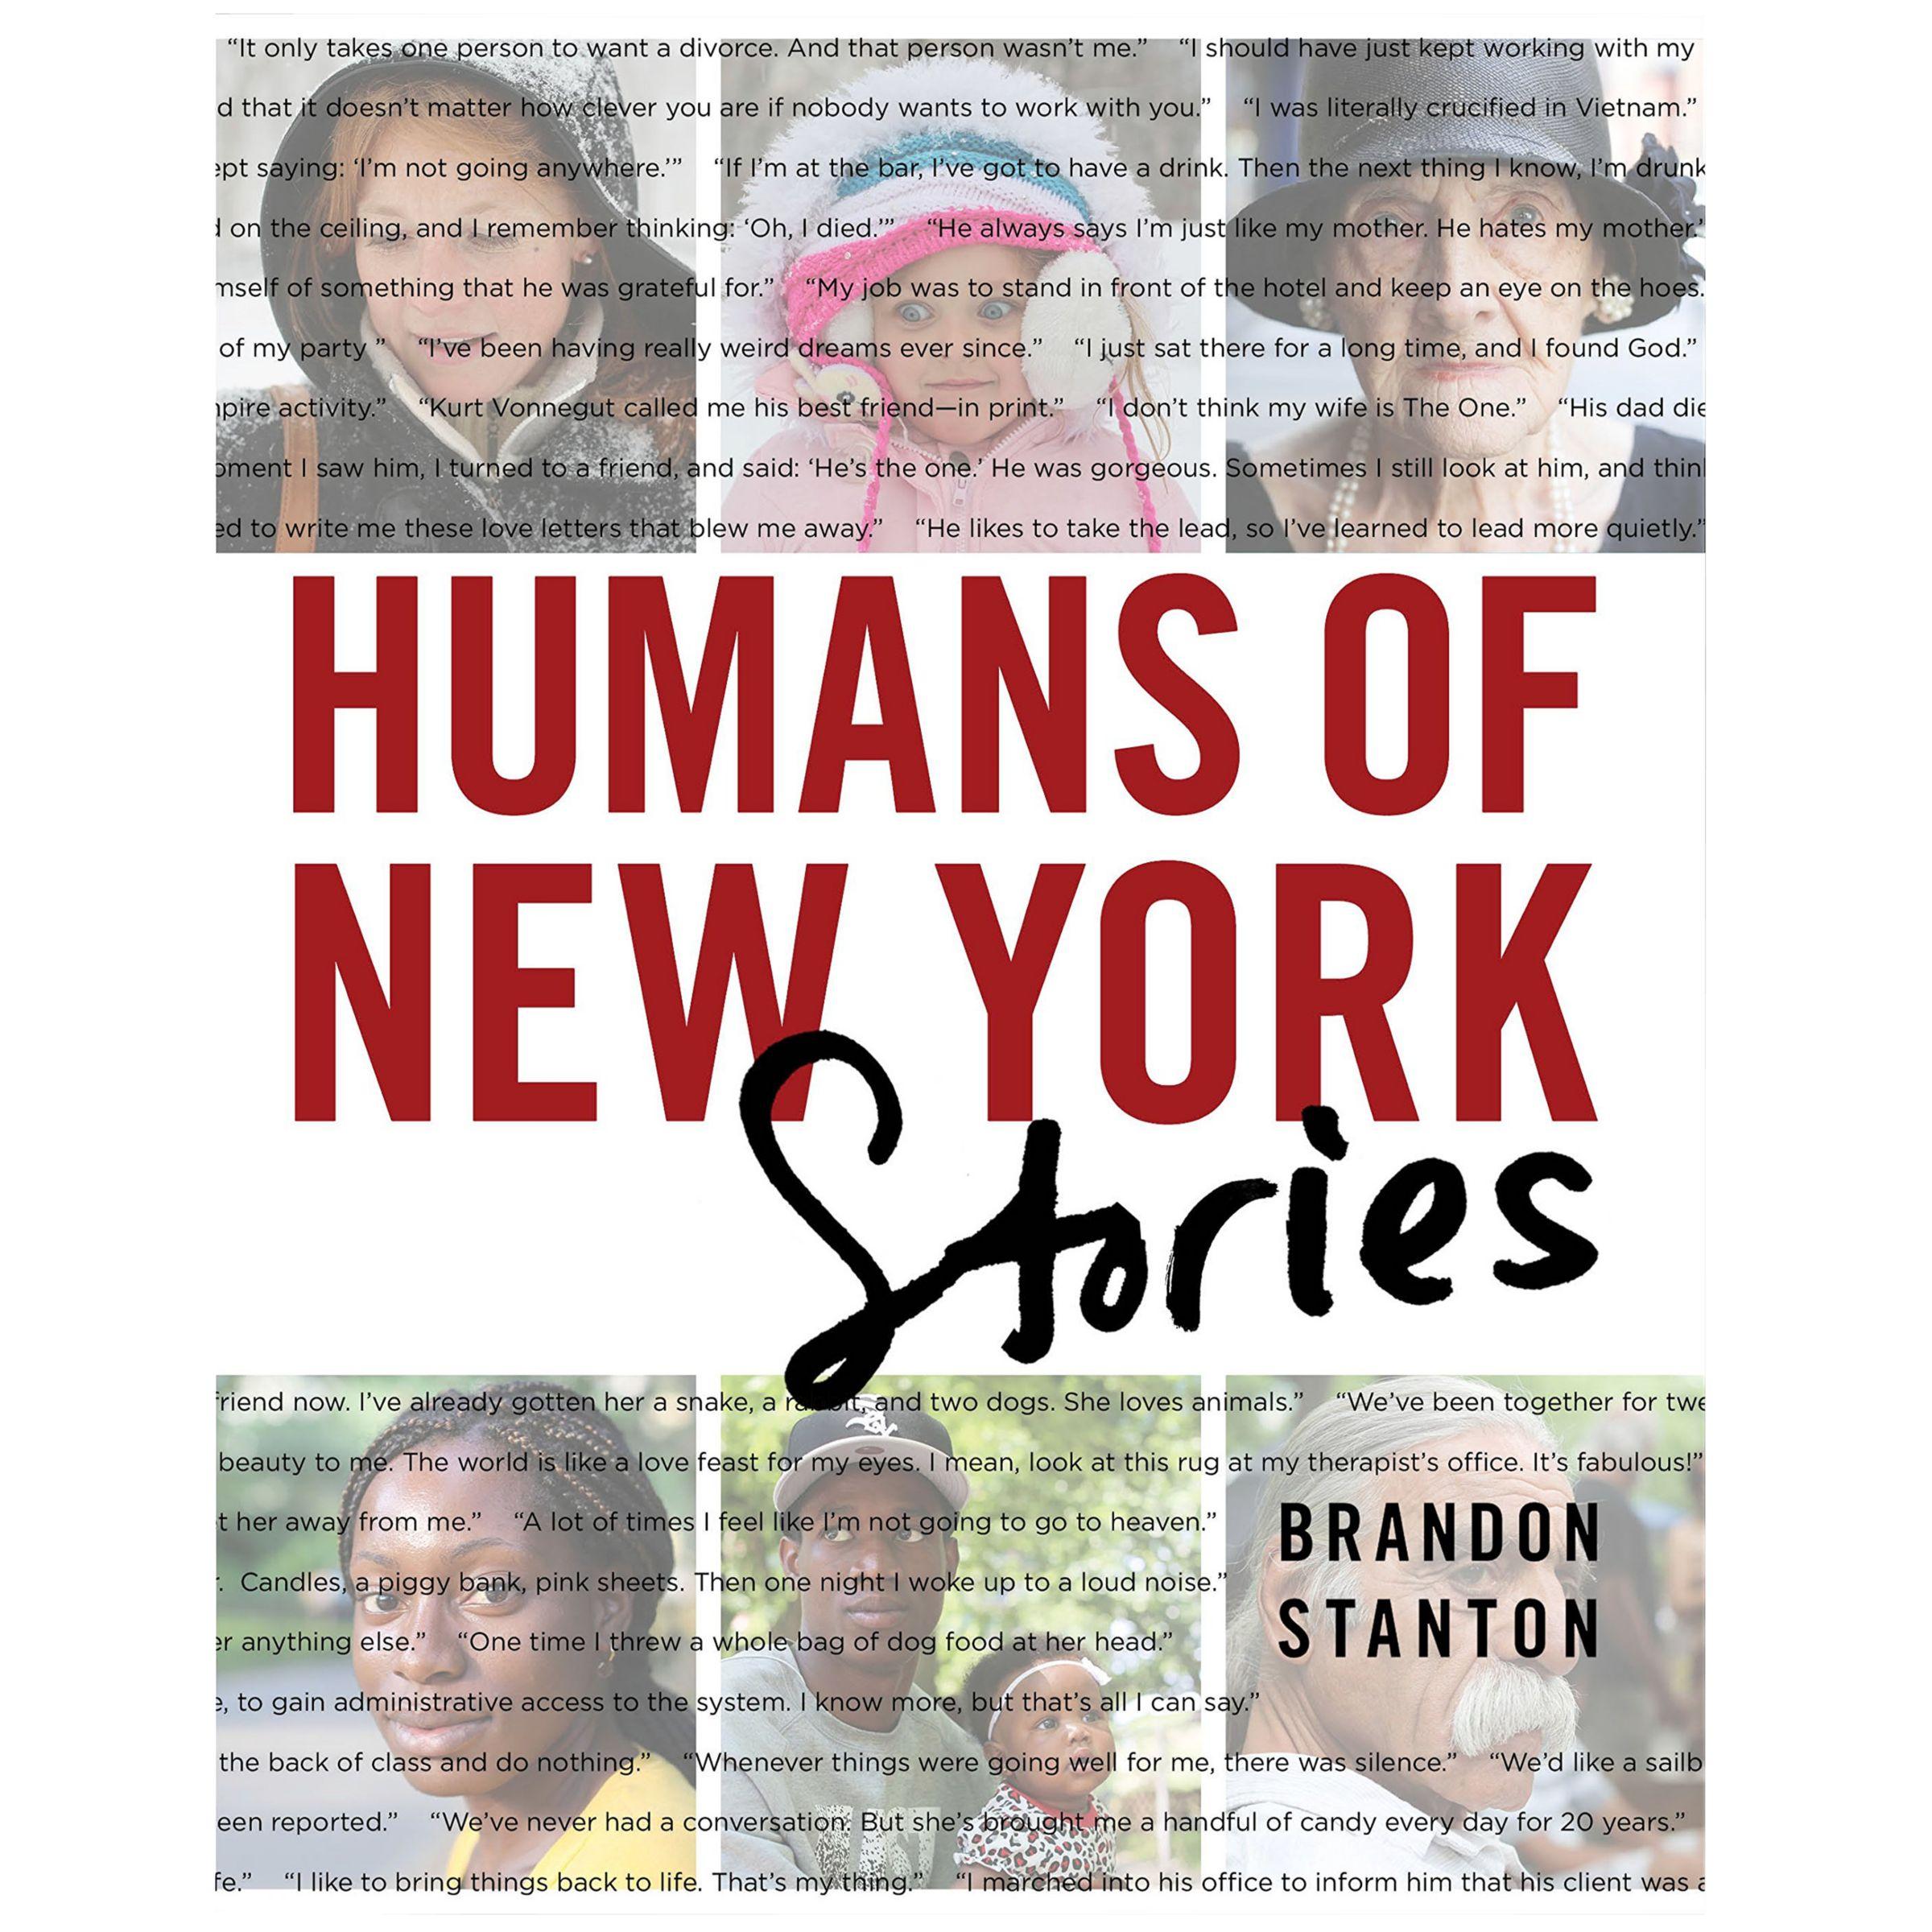 Brandon Stanton Humans Of New York Stories at John Lewis